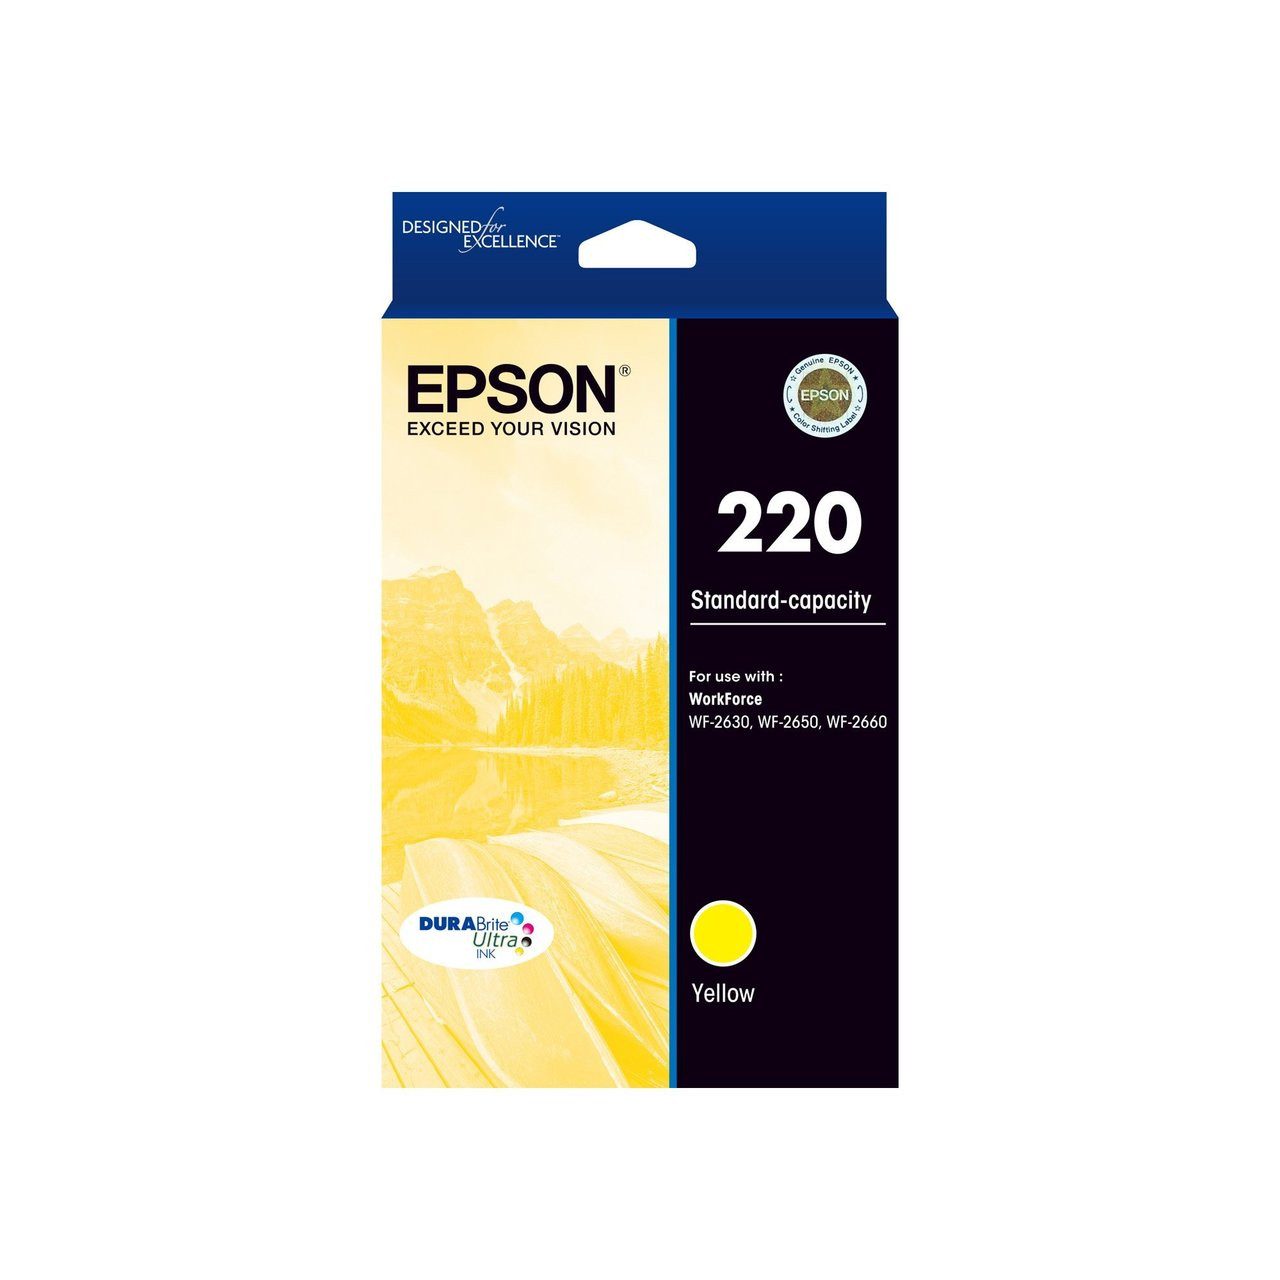 EPSON C13T293492 220 STANDARD CAPACITY INKJET CARTRIDGE DURABRITE ULTRA  YELLOW